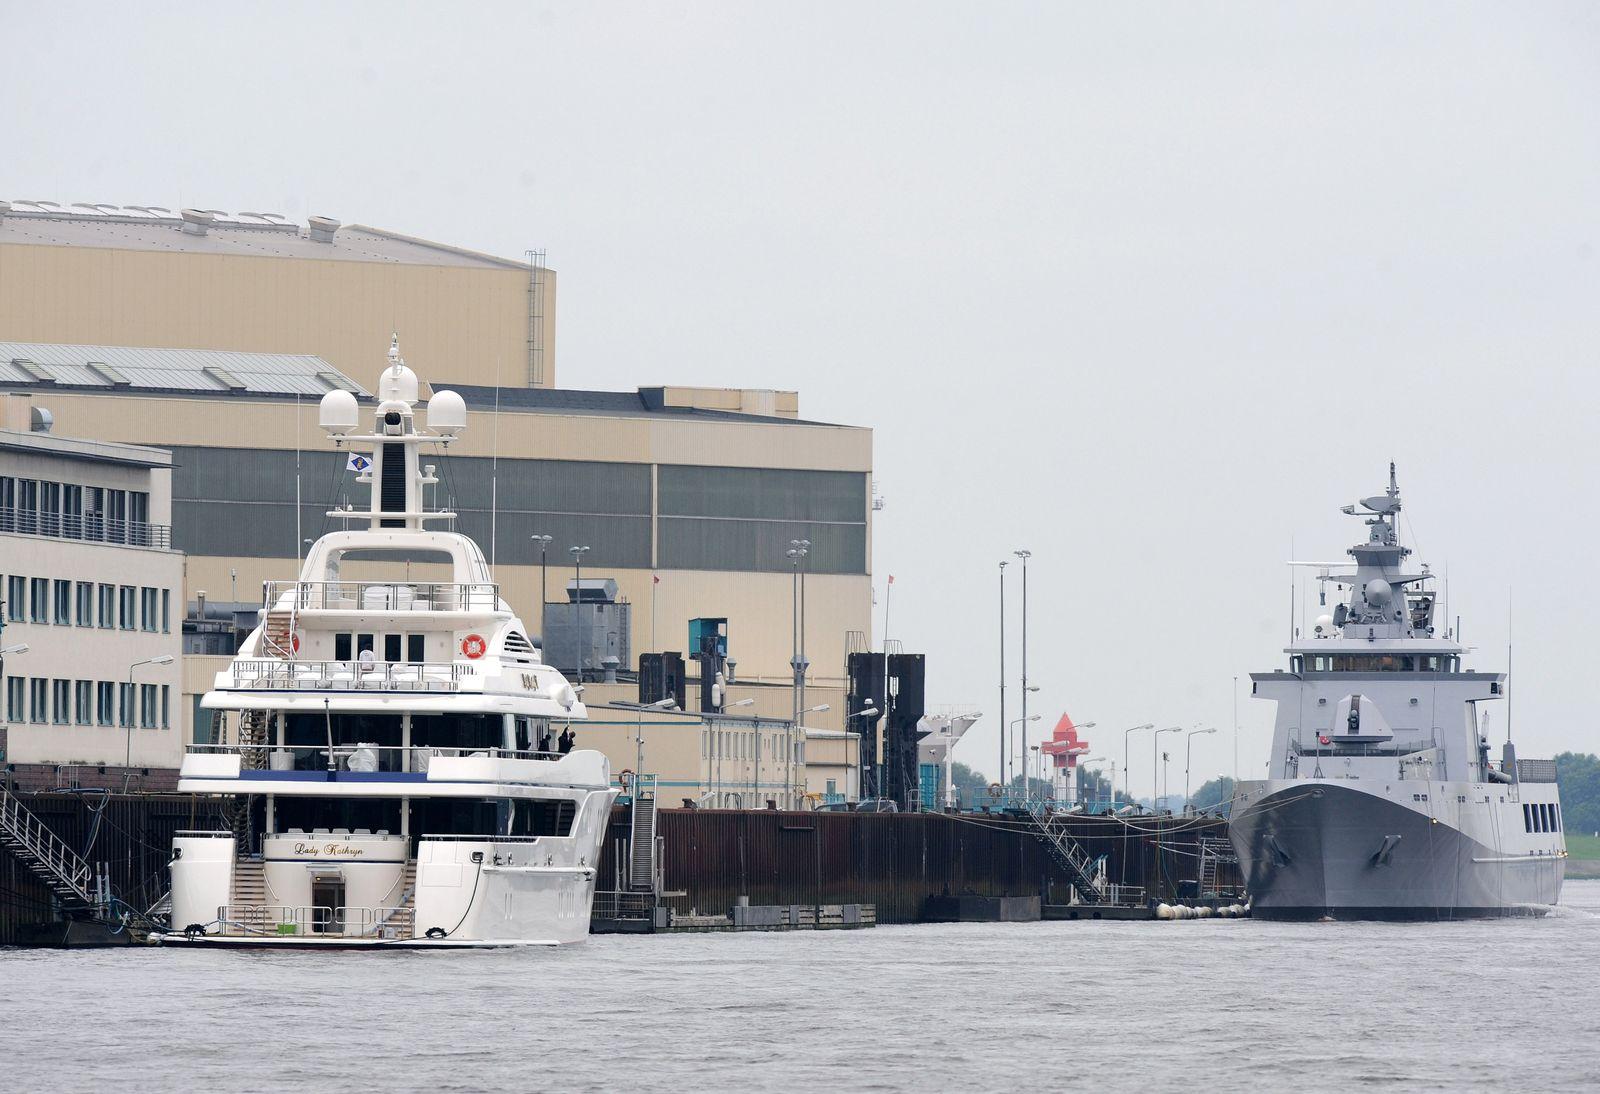 Lürssen-Werft